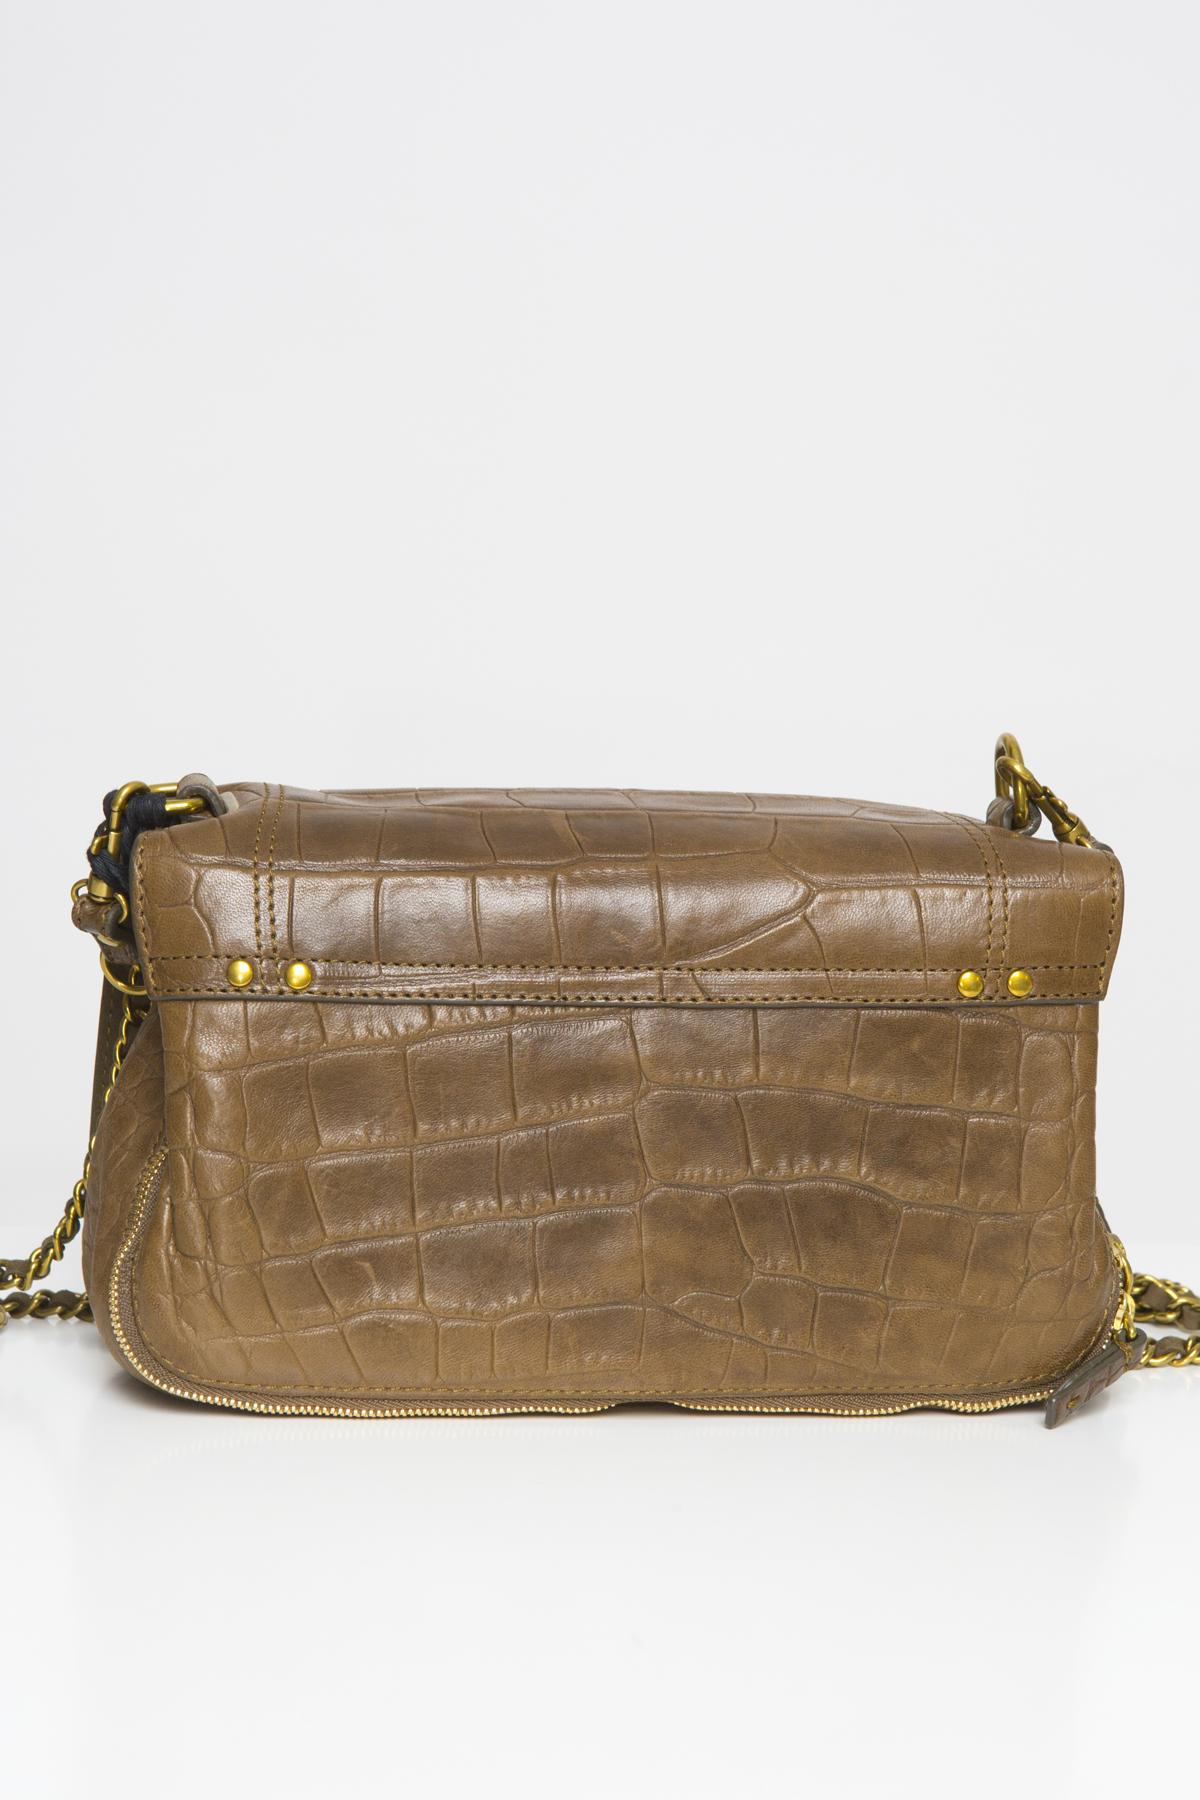 bobi-bag-leather-jerome-dreyfuss-croco-kaki-matchboxathens